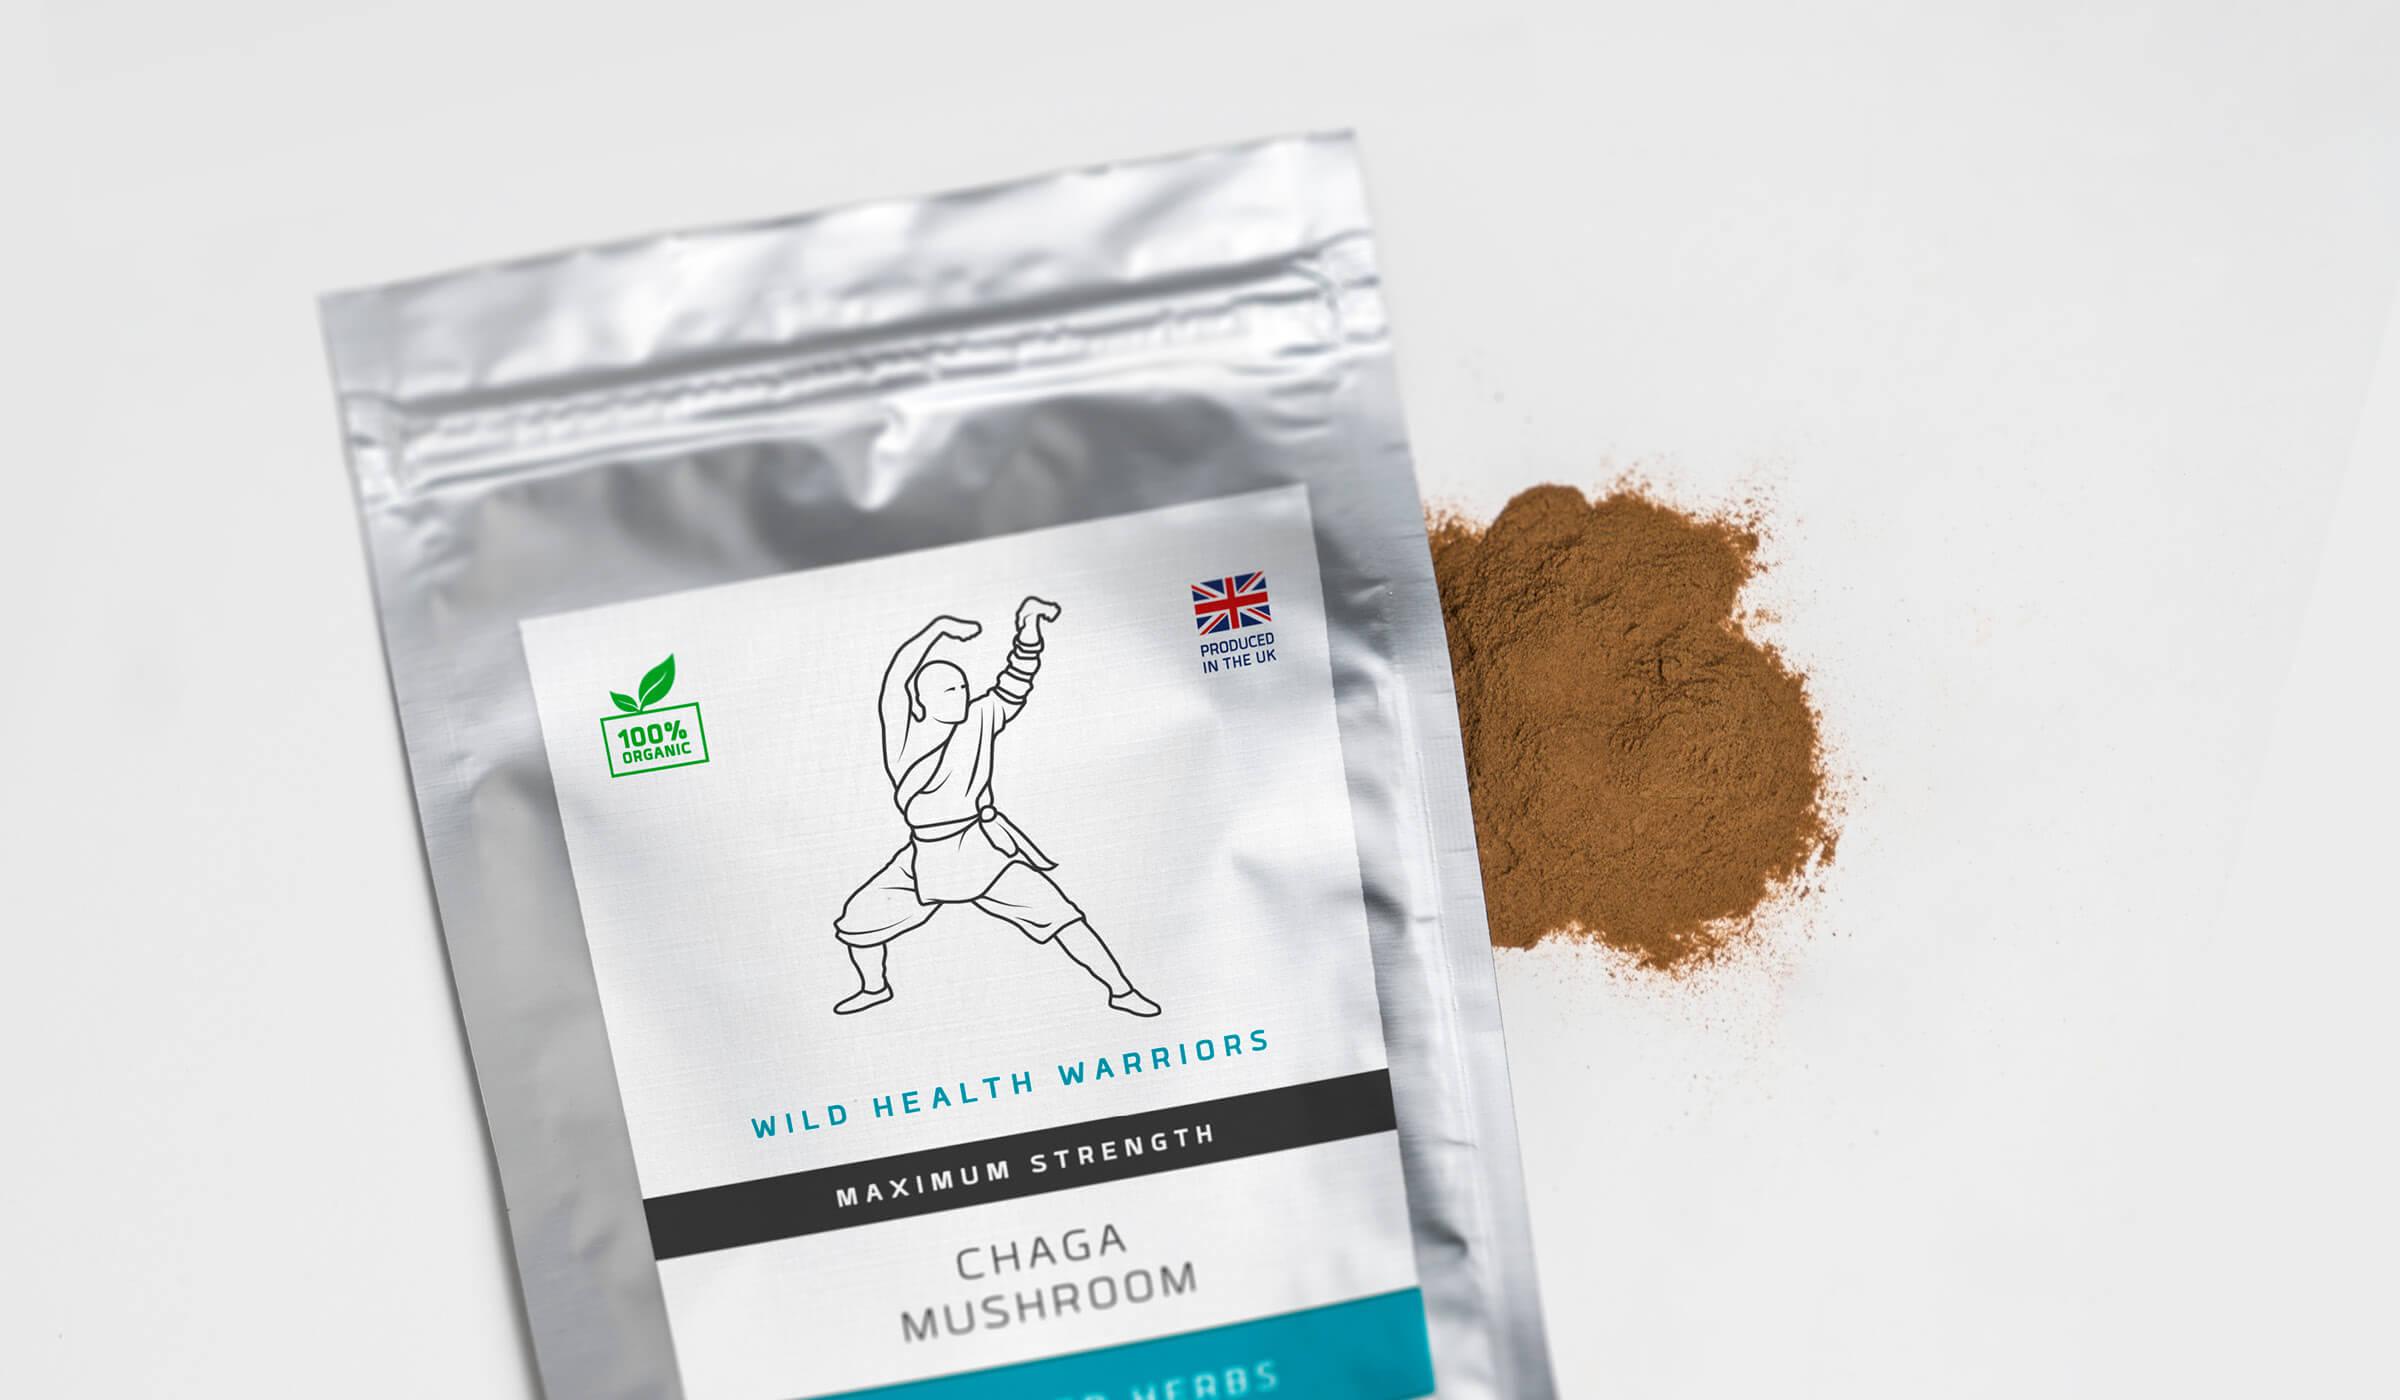 Health supplements sachet packaging design